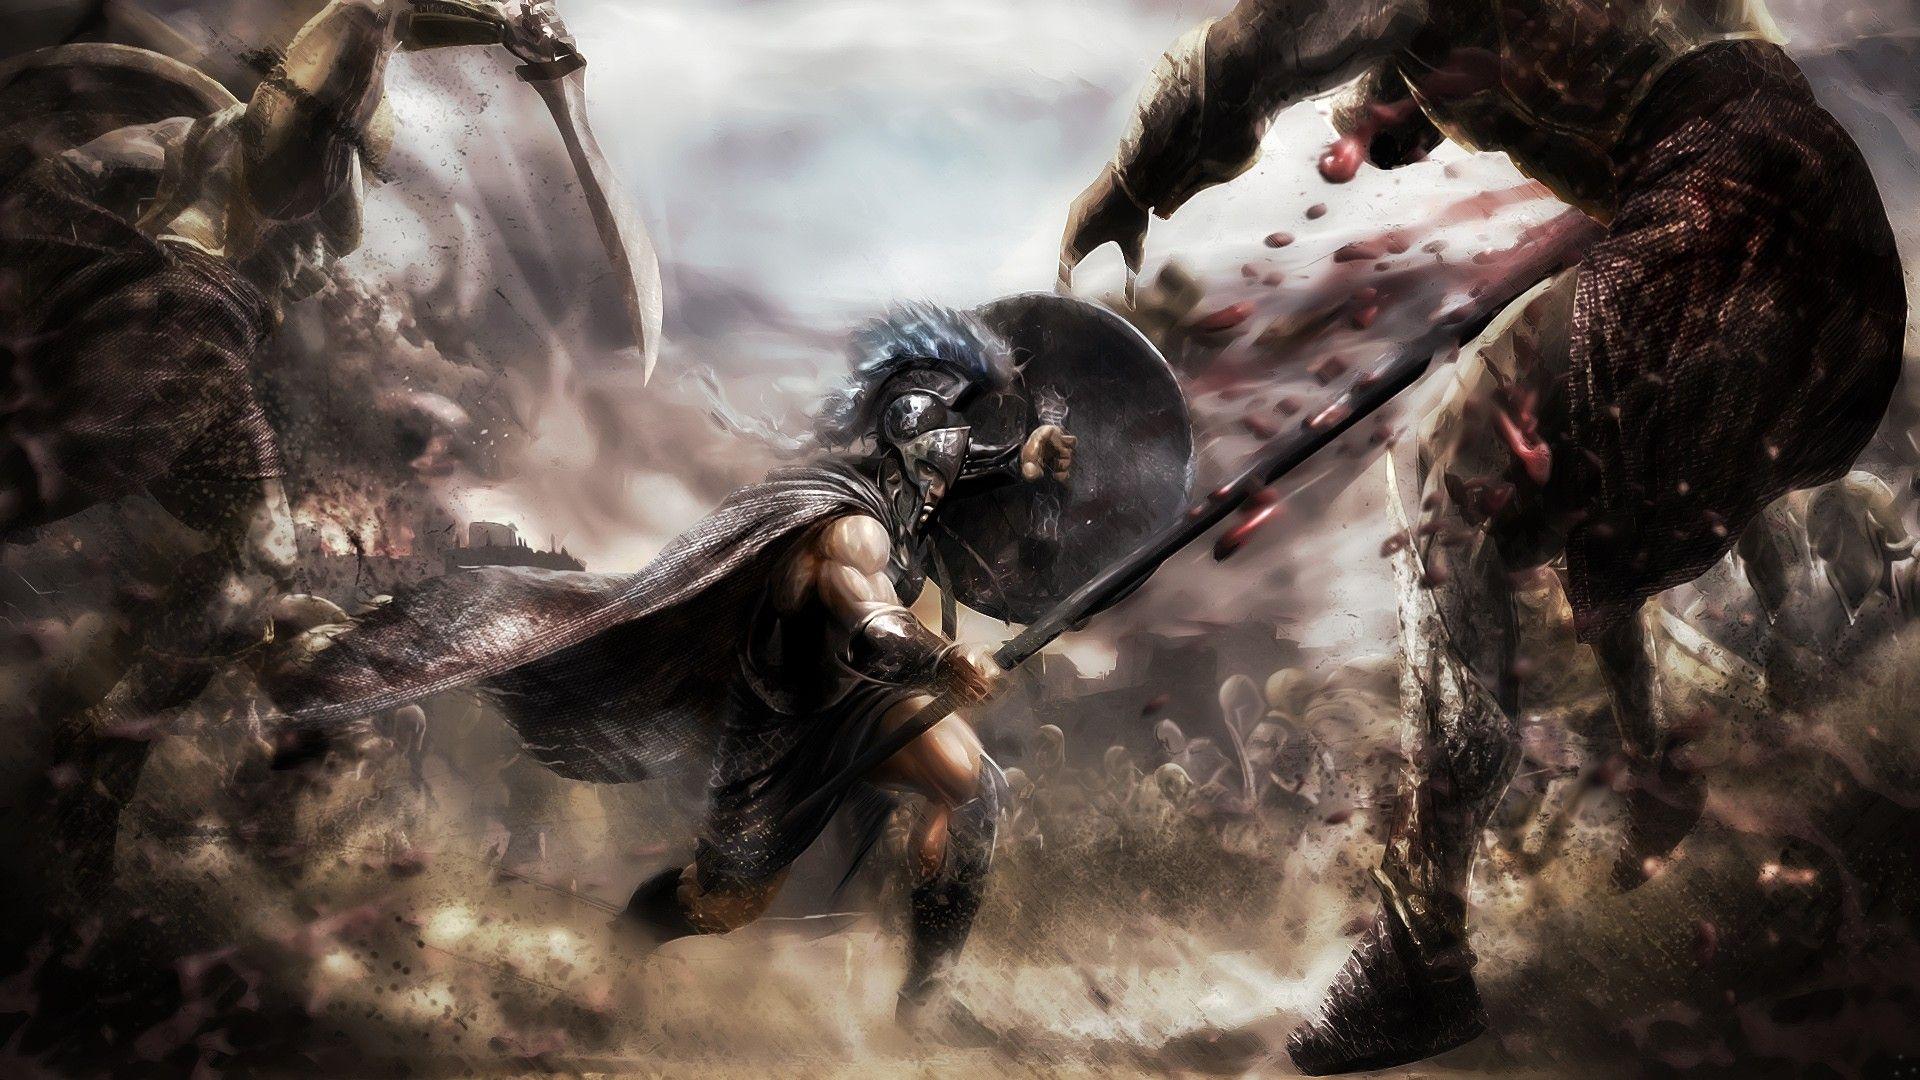 Warrior Full Hd Wallpaper Http Wallpapers And Backgrounds Net Warrior Full Hd Wallpaper Warriors Wallpaper Greek Warrior Fantasy Artwork